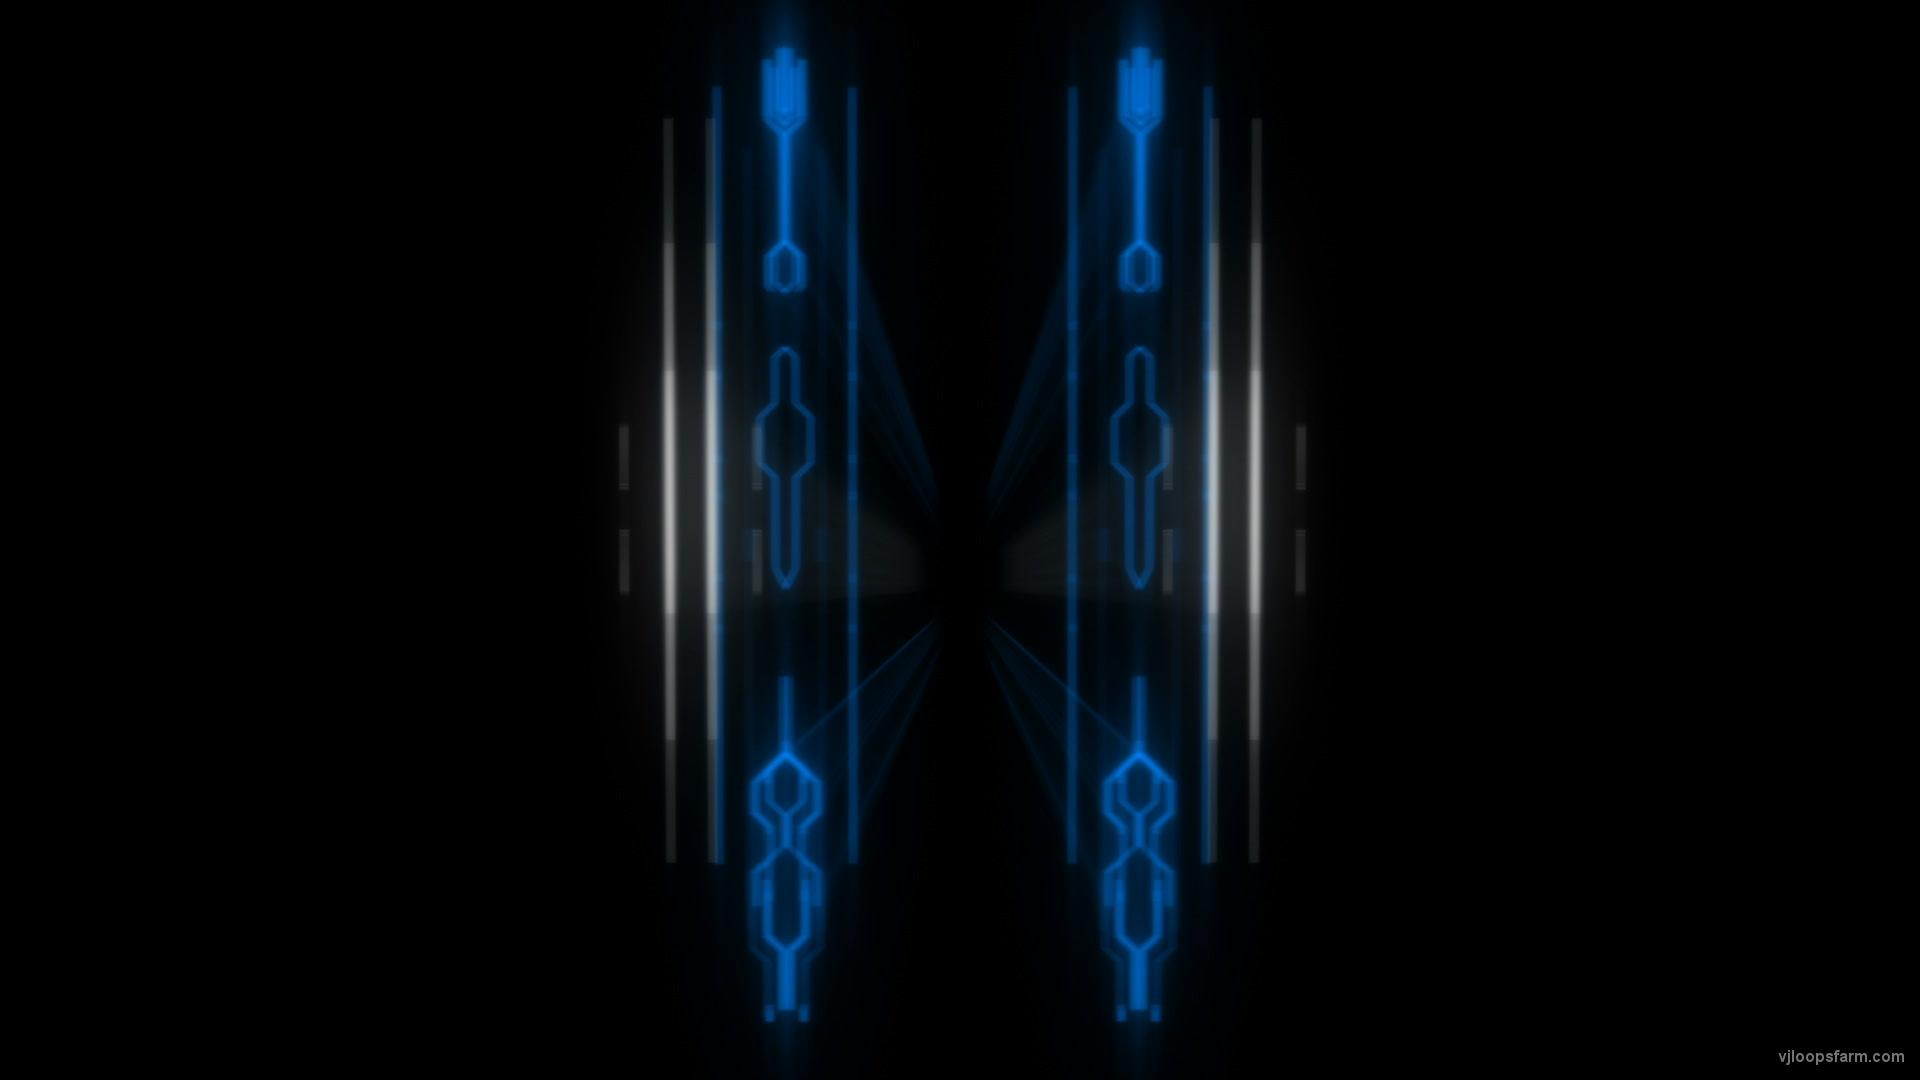 vj video background Blue-acid-techno-open-gate-Visuals-VJ-Loop_003